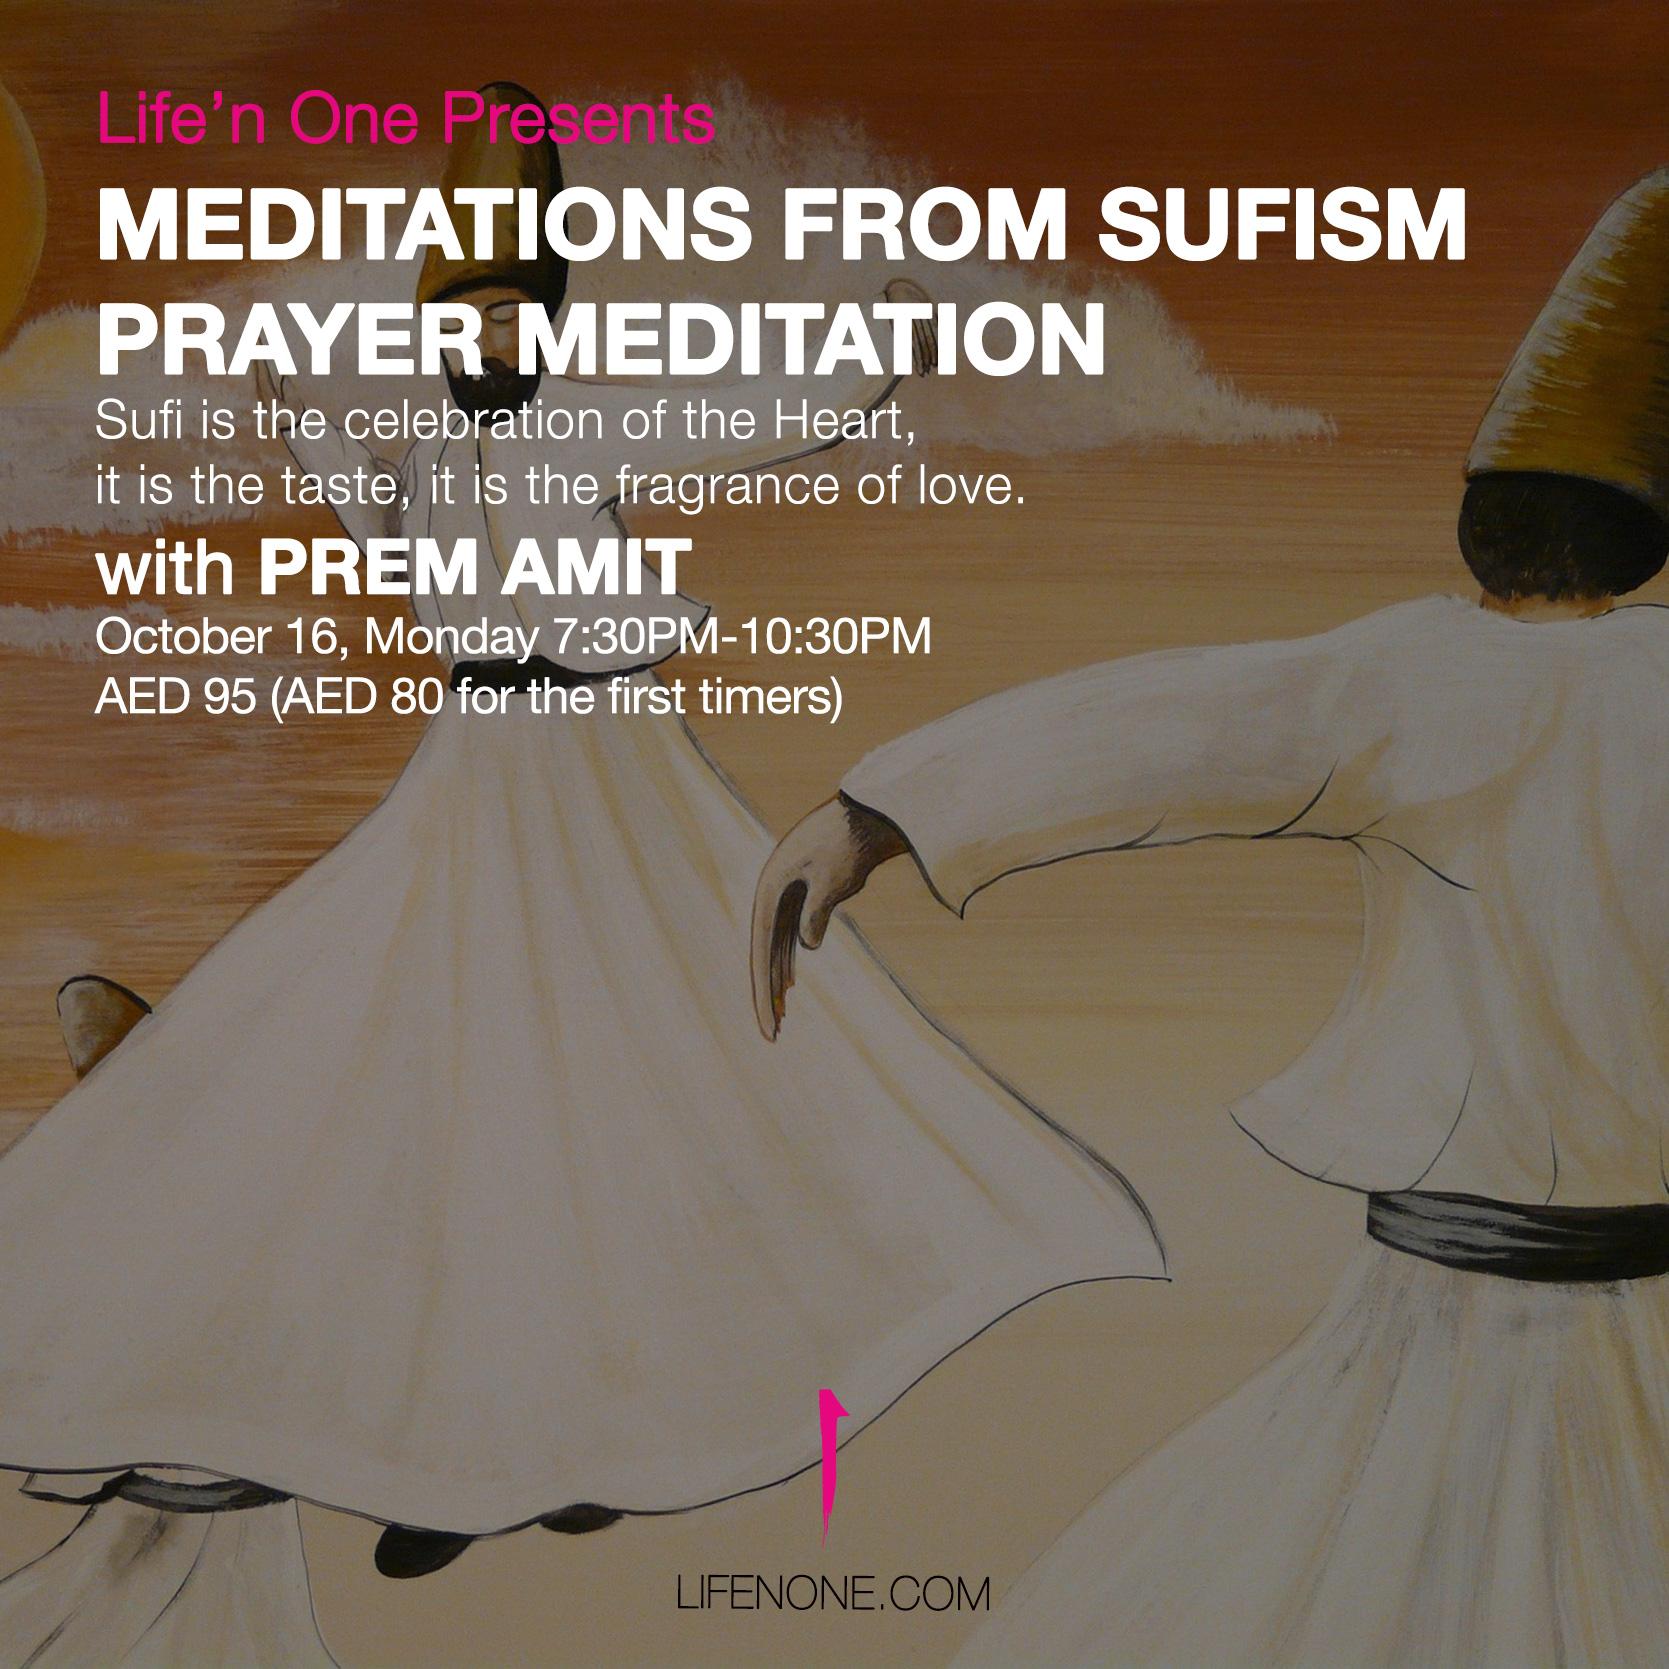 sufism-prayer-meditation.jpg